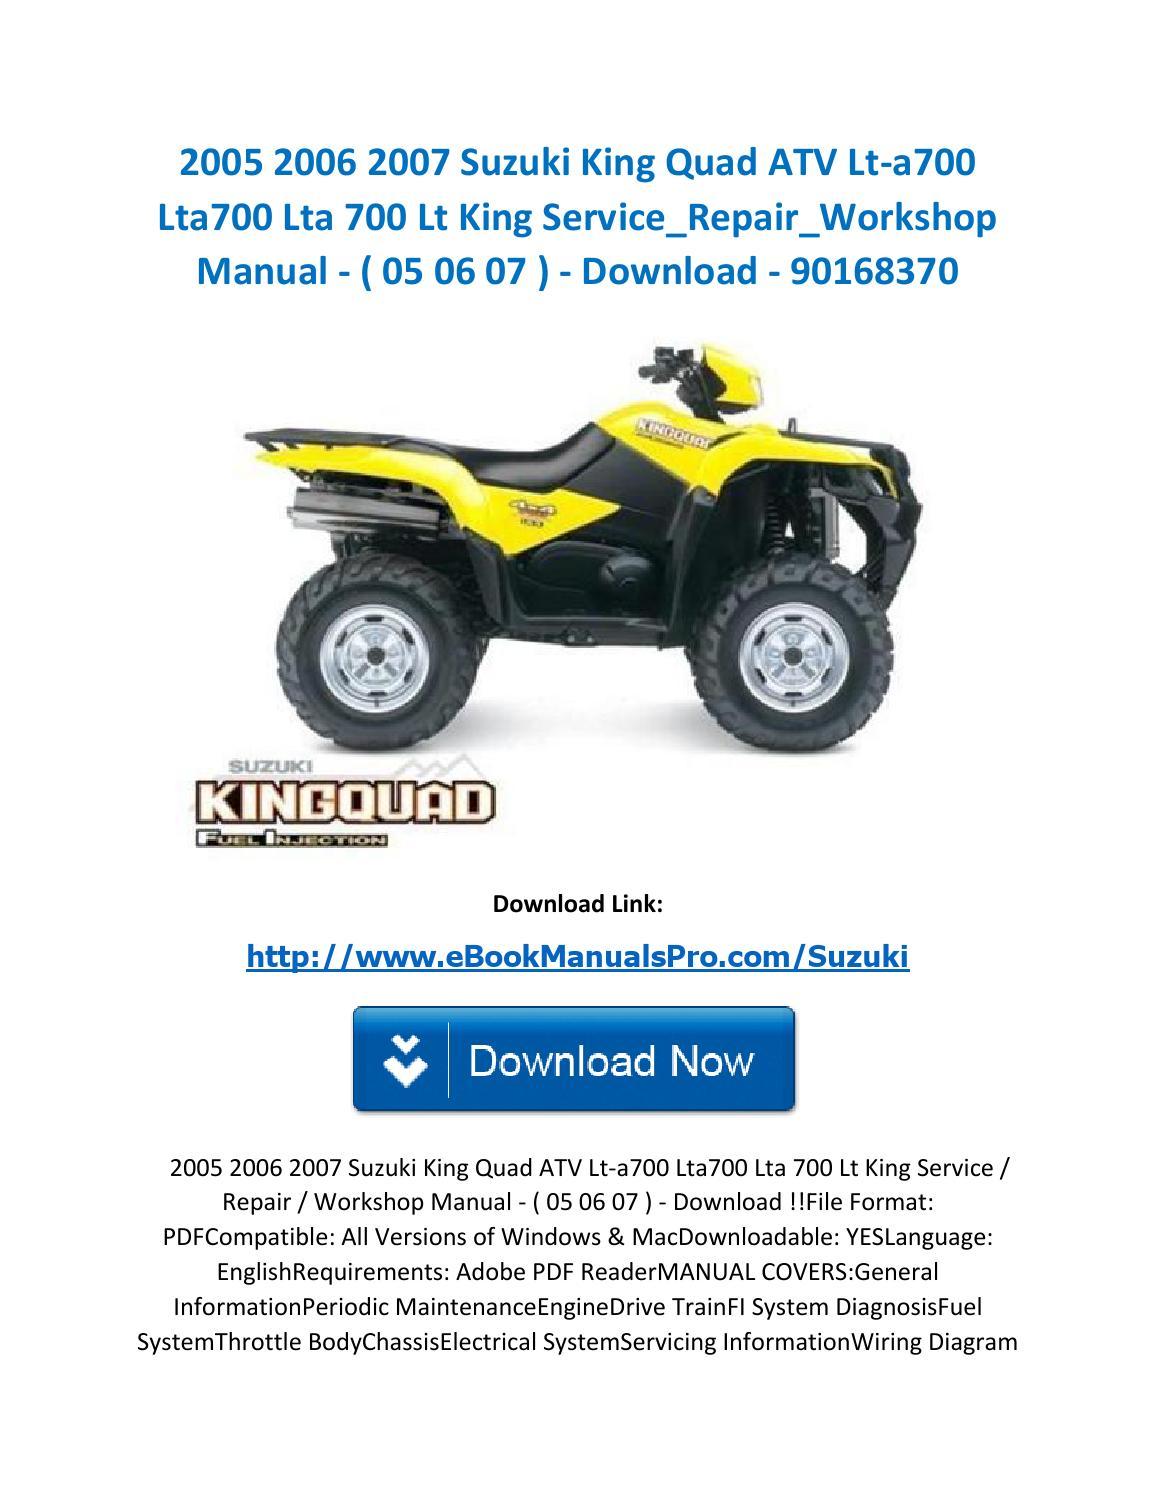 2005 2006 2007 Suzuki King Quad Atv Lt A700 Lta700 Lta 700 Wiring Diagram Service Repair Workshop Manual By Ebookmanualspro Issuu